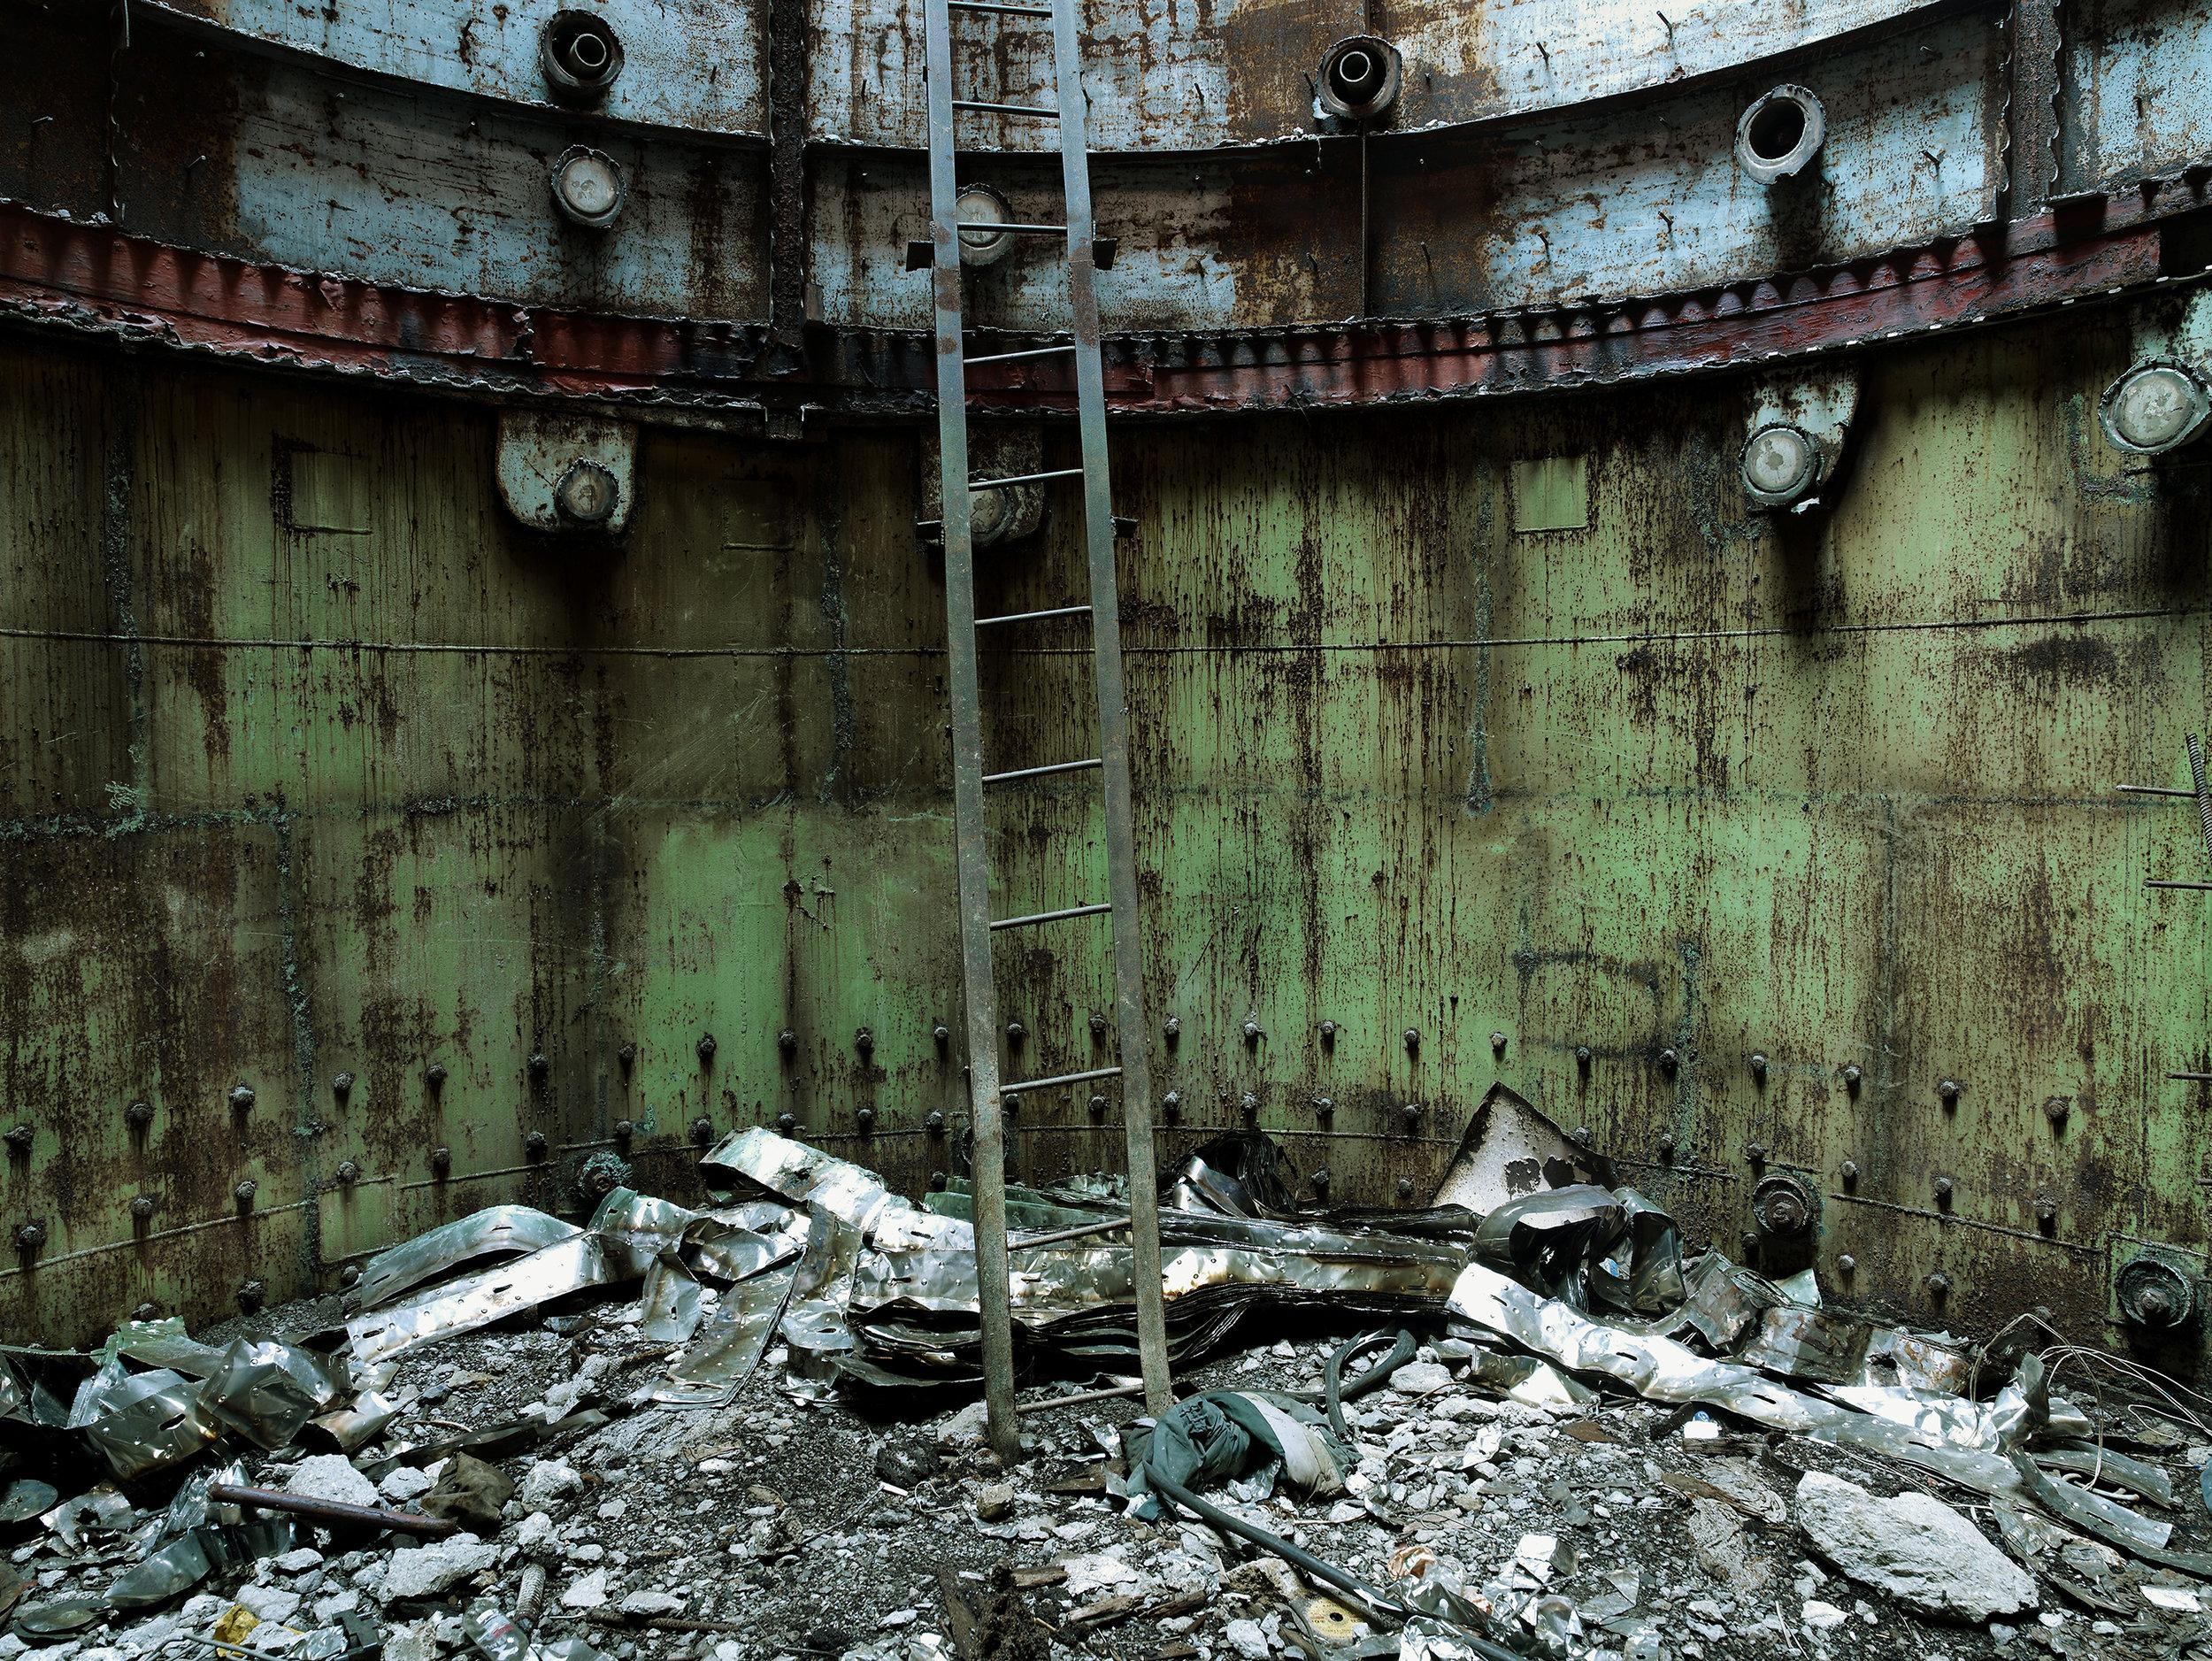 Heart of nuclear reactor, Ukraine, 2007.